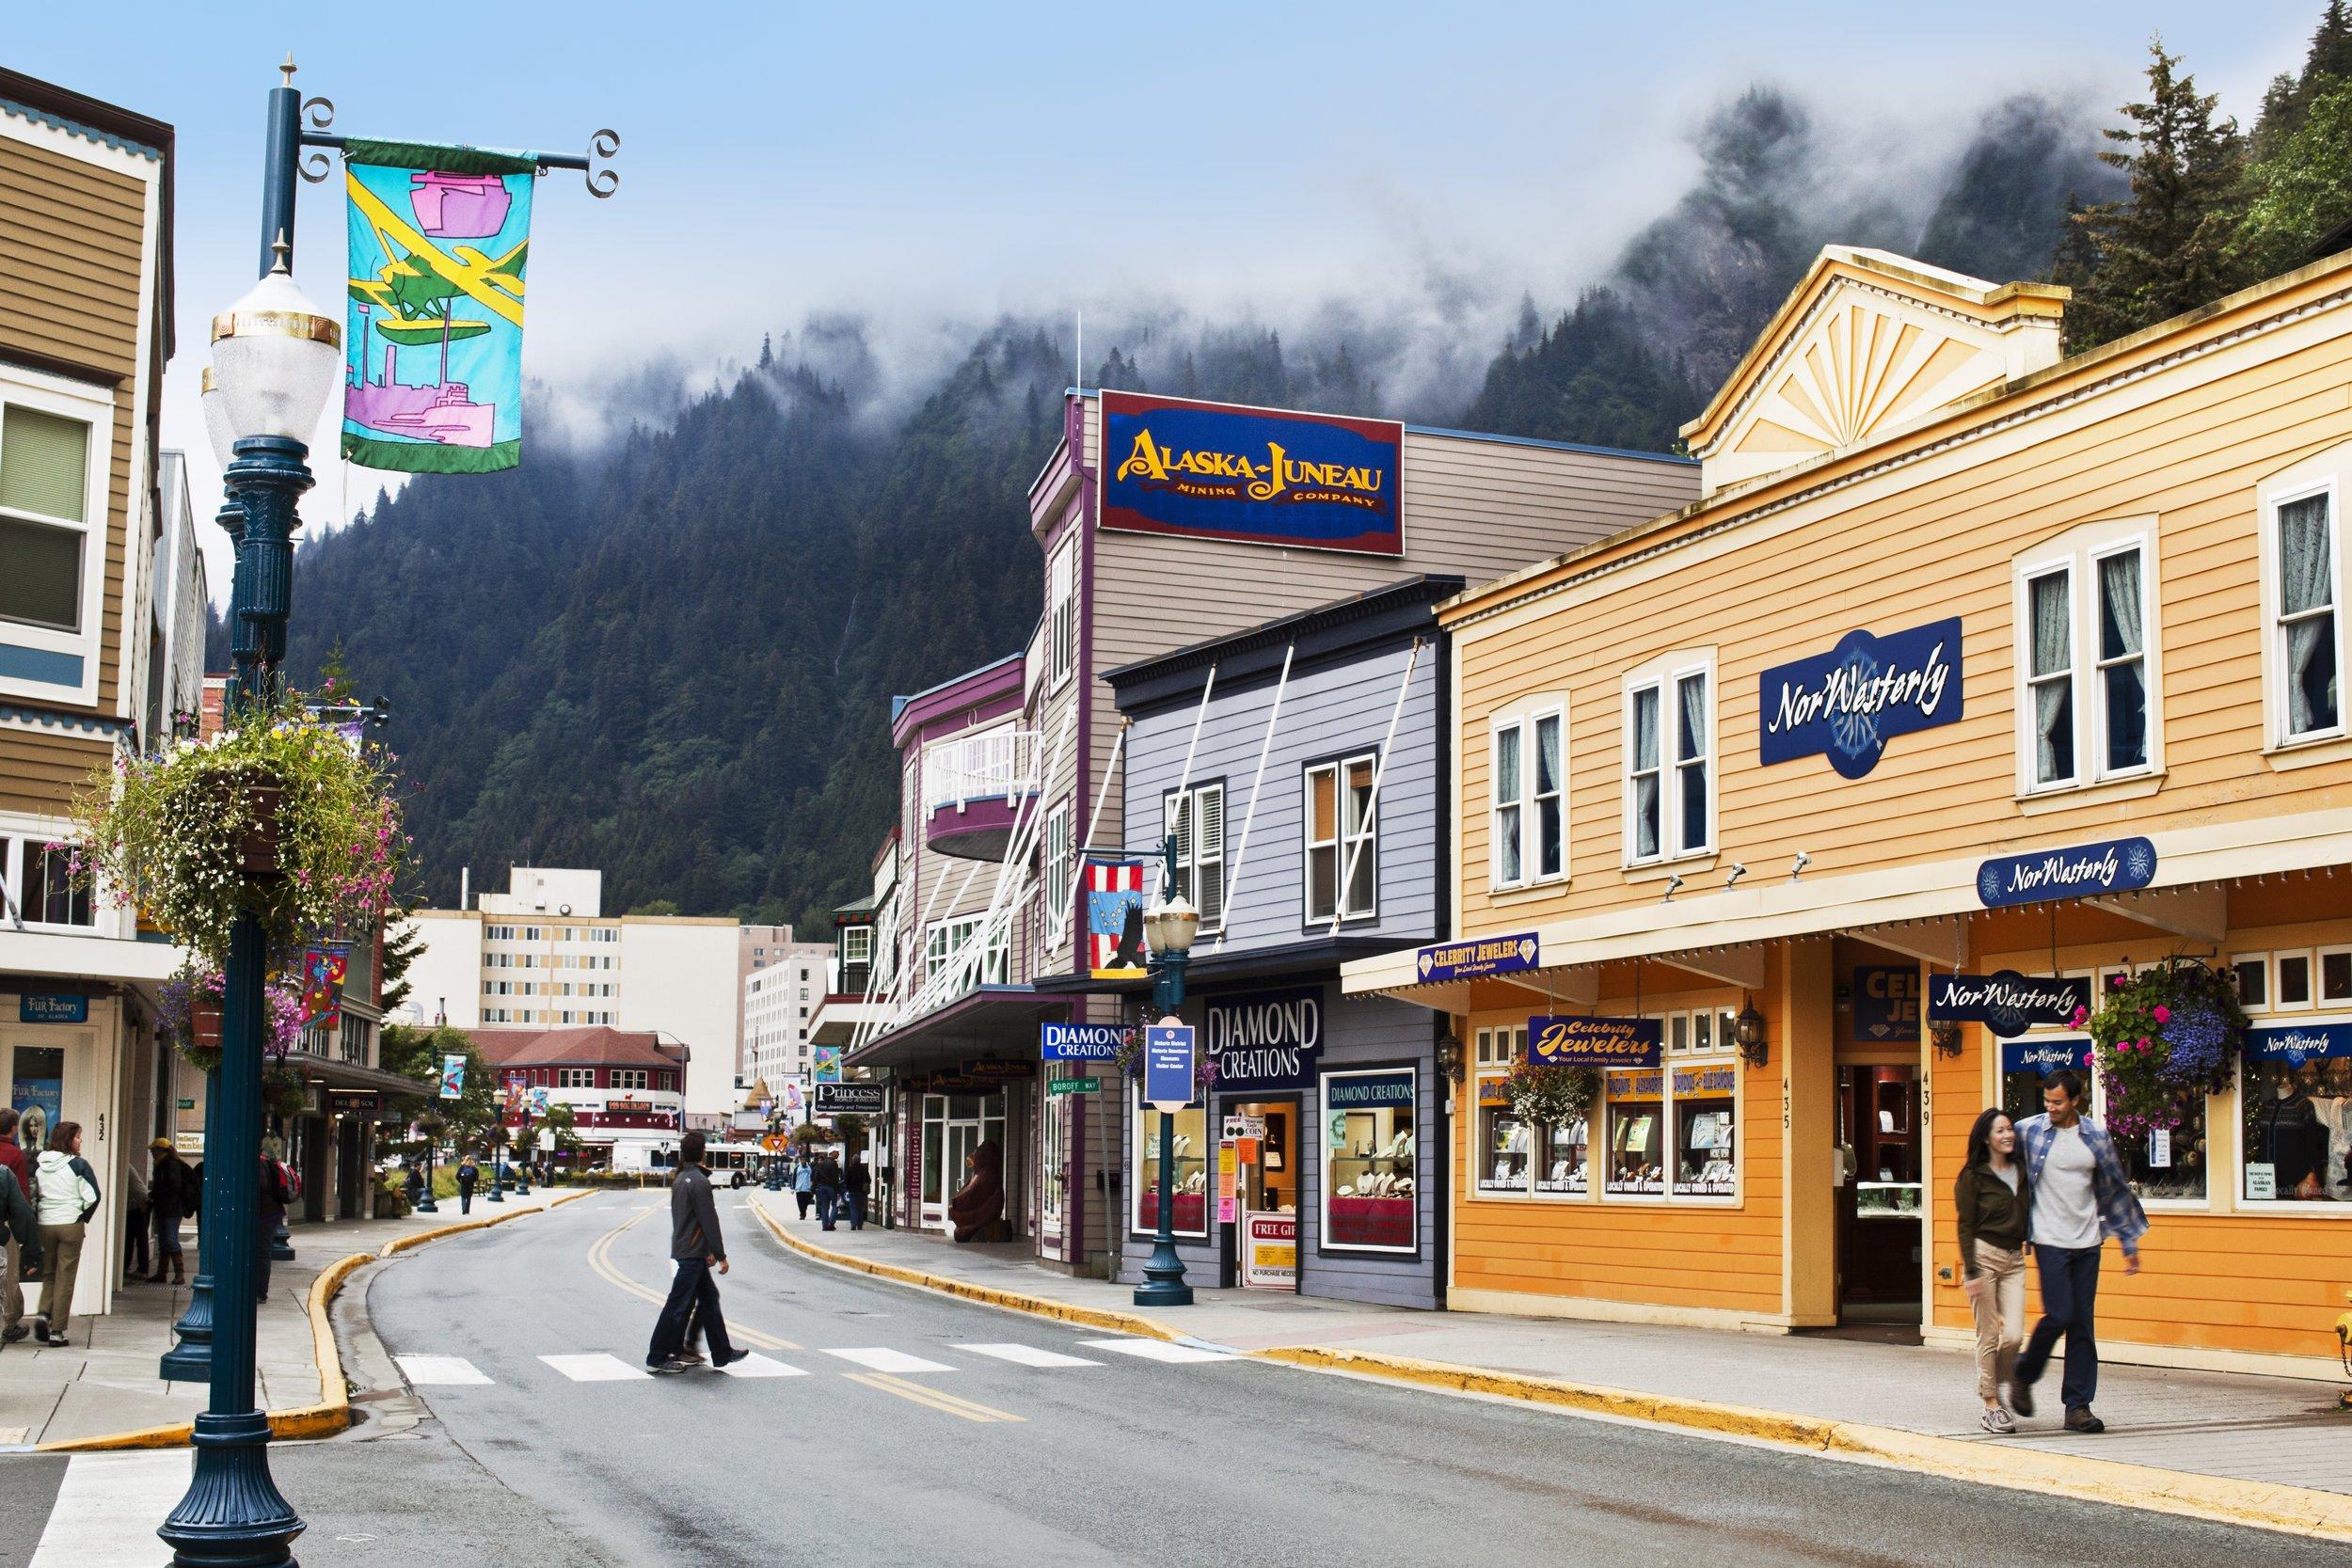 Alaska Juneau Stadt IMG_4839.jpg